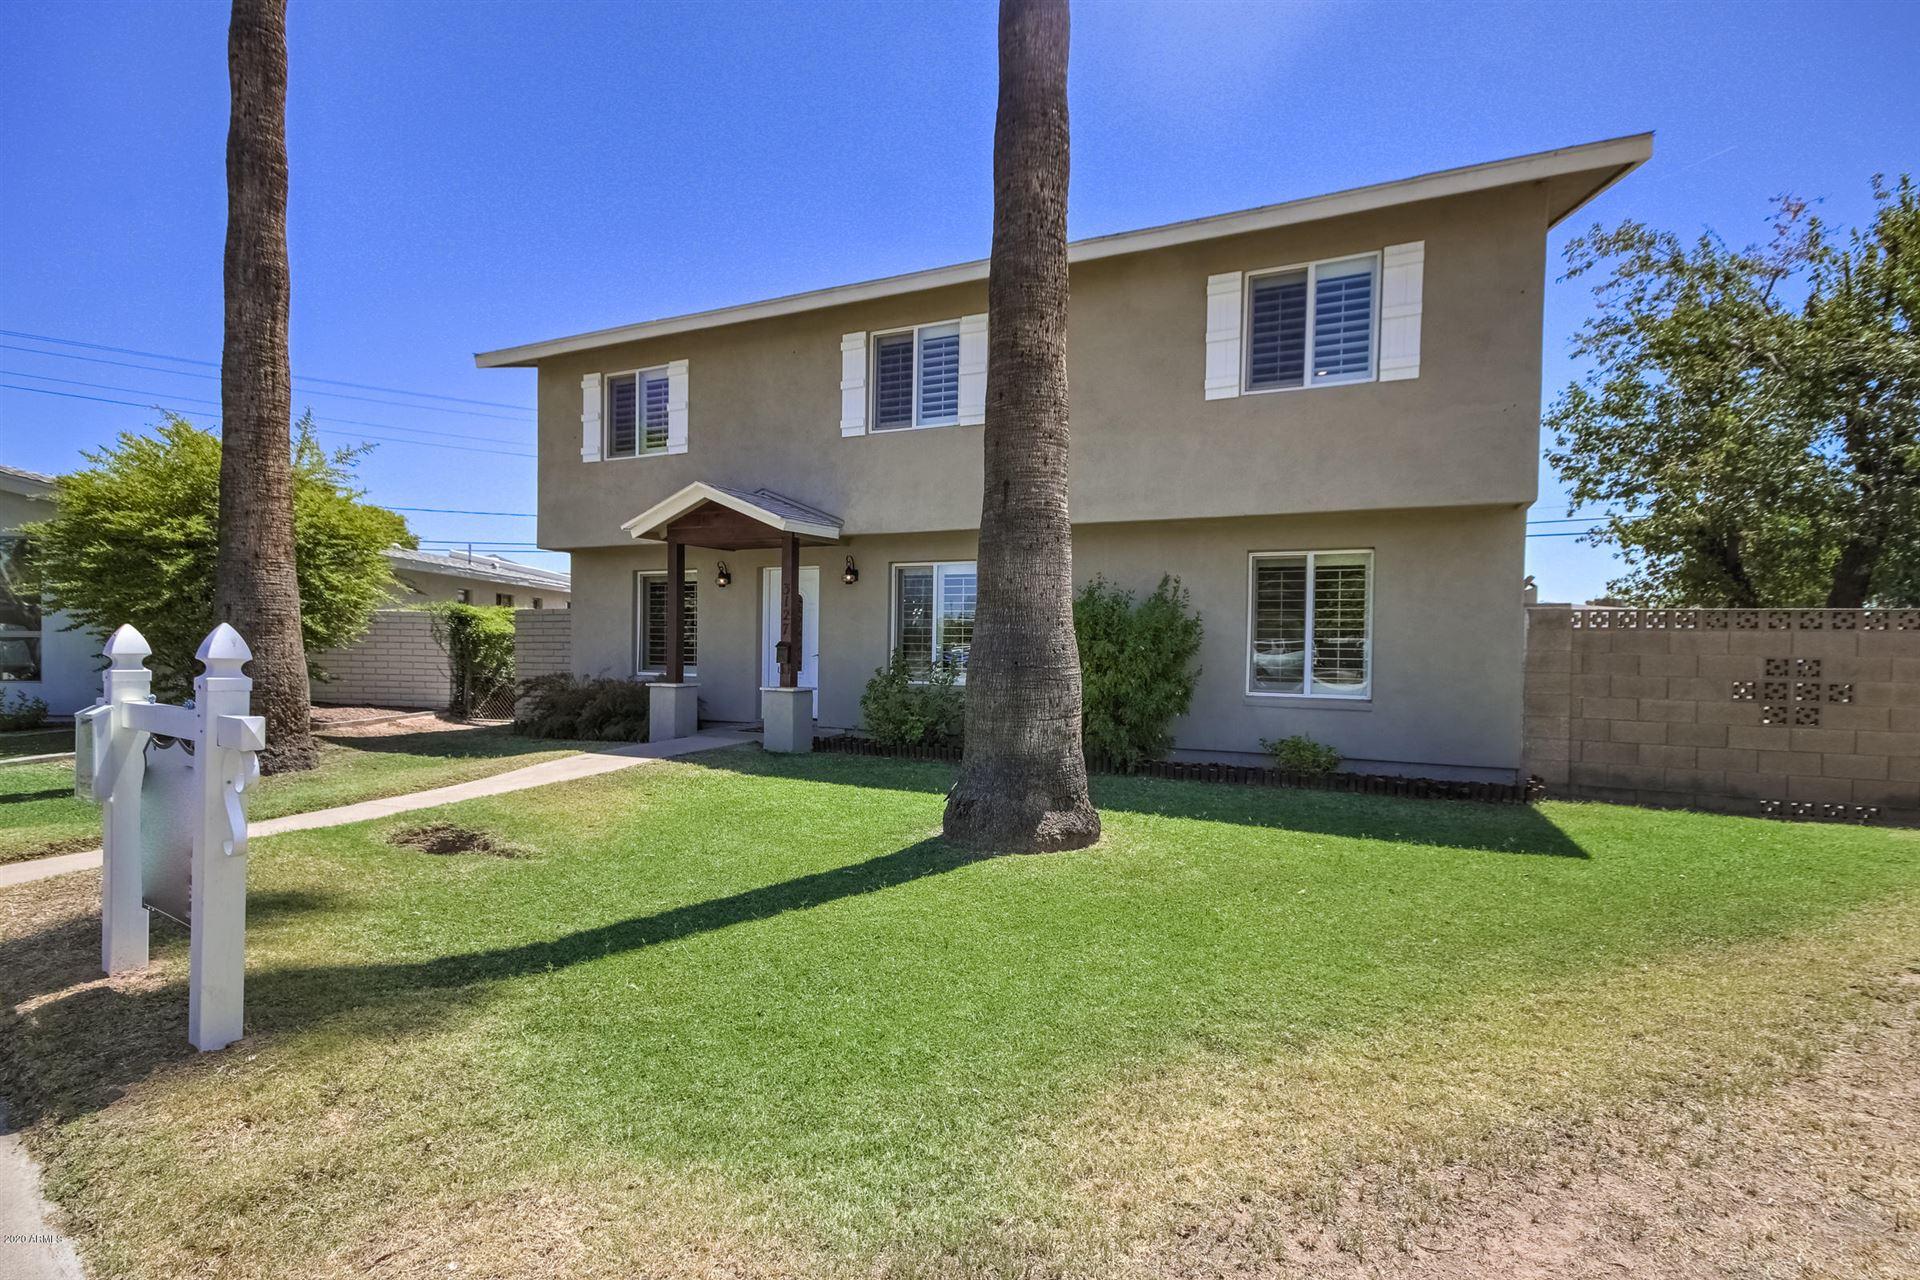 3127 N 81ST Place, Scottsdale, AZ 85251 - #: 6097936